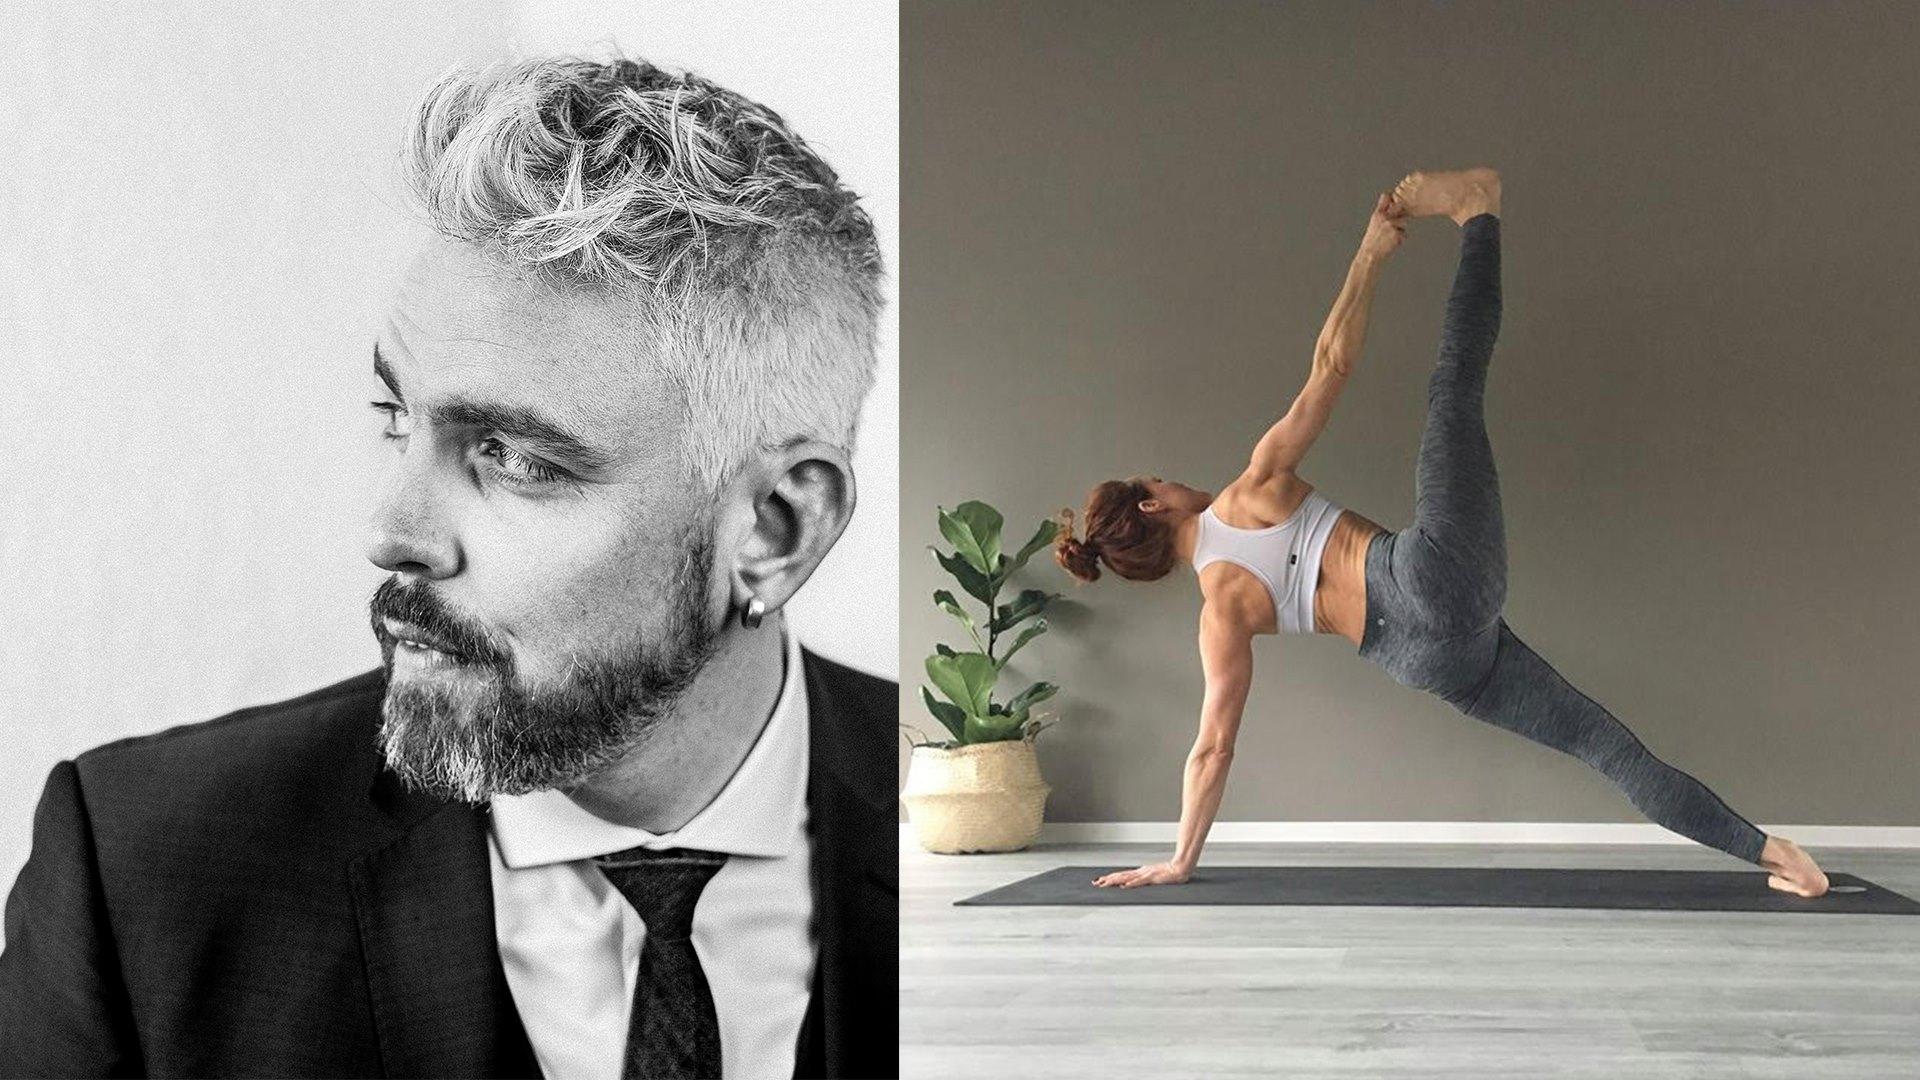 Yogahelg, Yoga weekend, Trygve Skaug konsert, yogahelg son spa, son spa pakke, årets julegave, Signe Schineller, Signe schineller yoga, resignert, yoga og poesi,